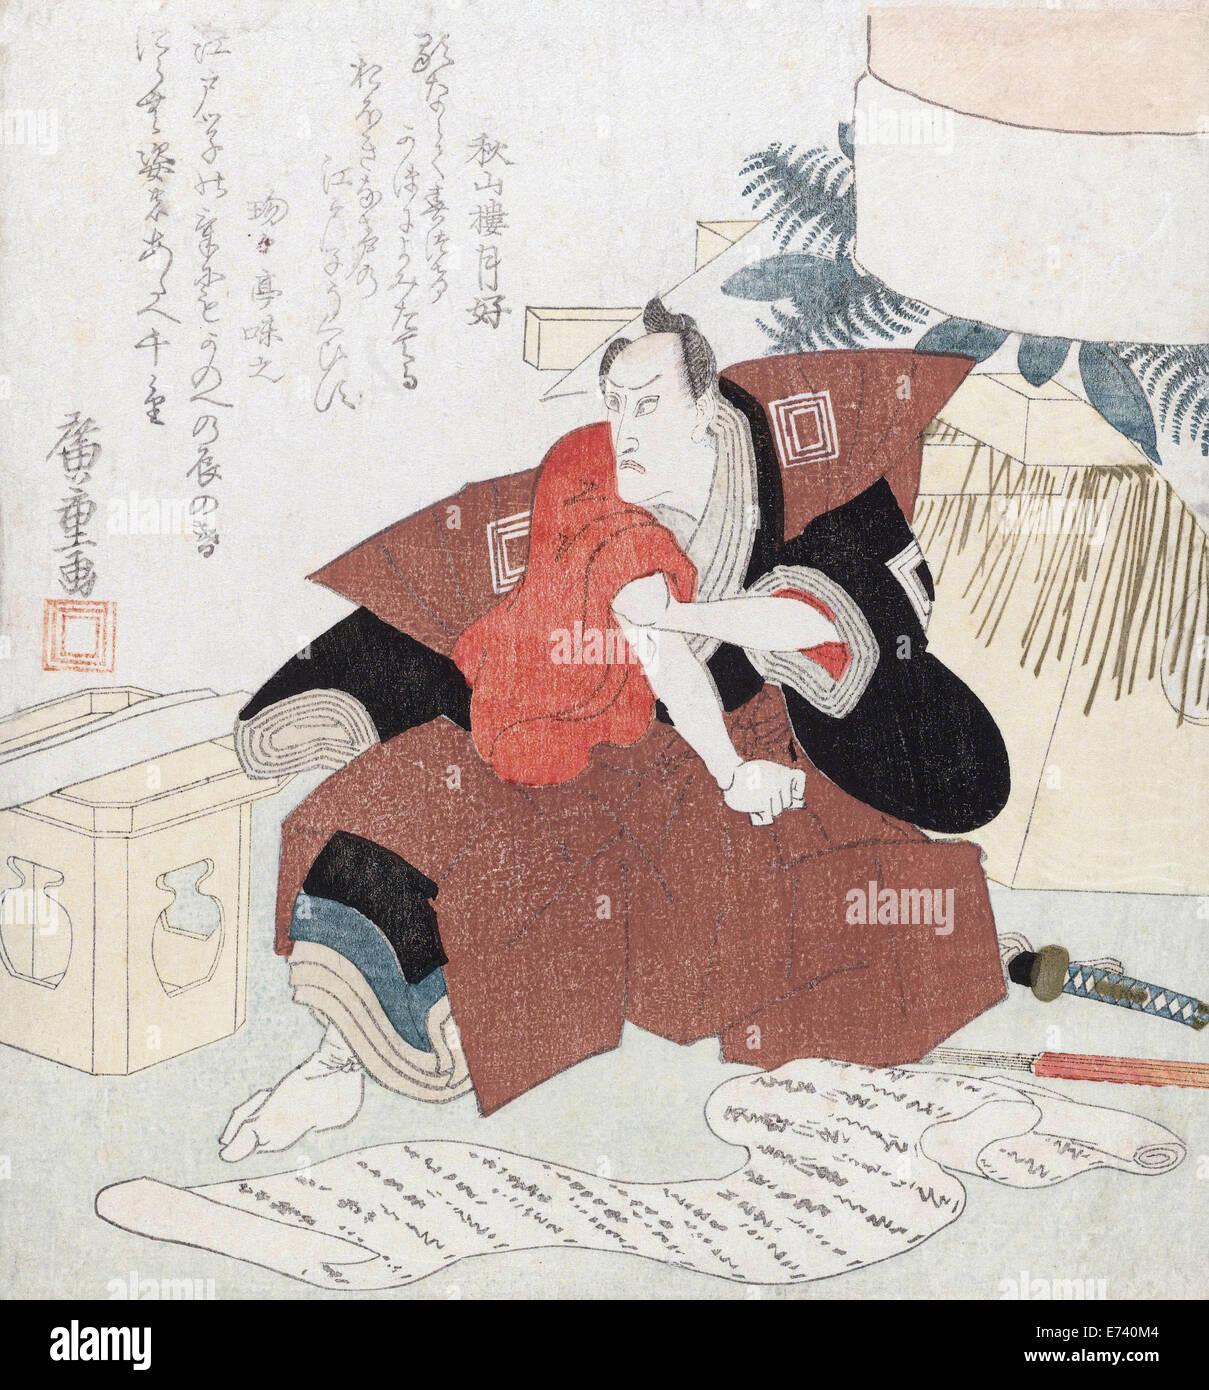 Ichikawa Danjûrô VII during New Year Hiroshige (I) Utagawa Shûsanrô Tsukiyoshi Chinjintei Ajiyuki, - Stock Image